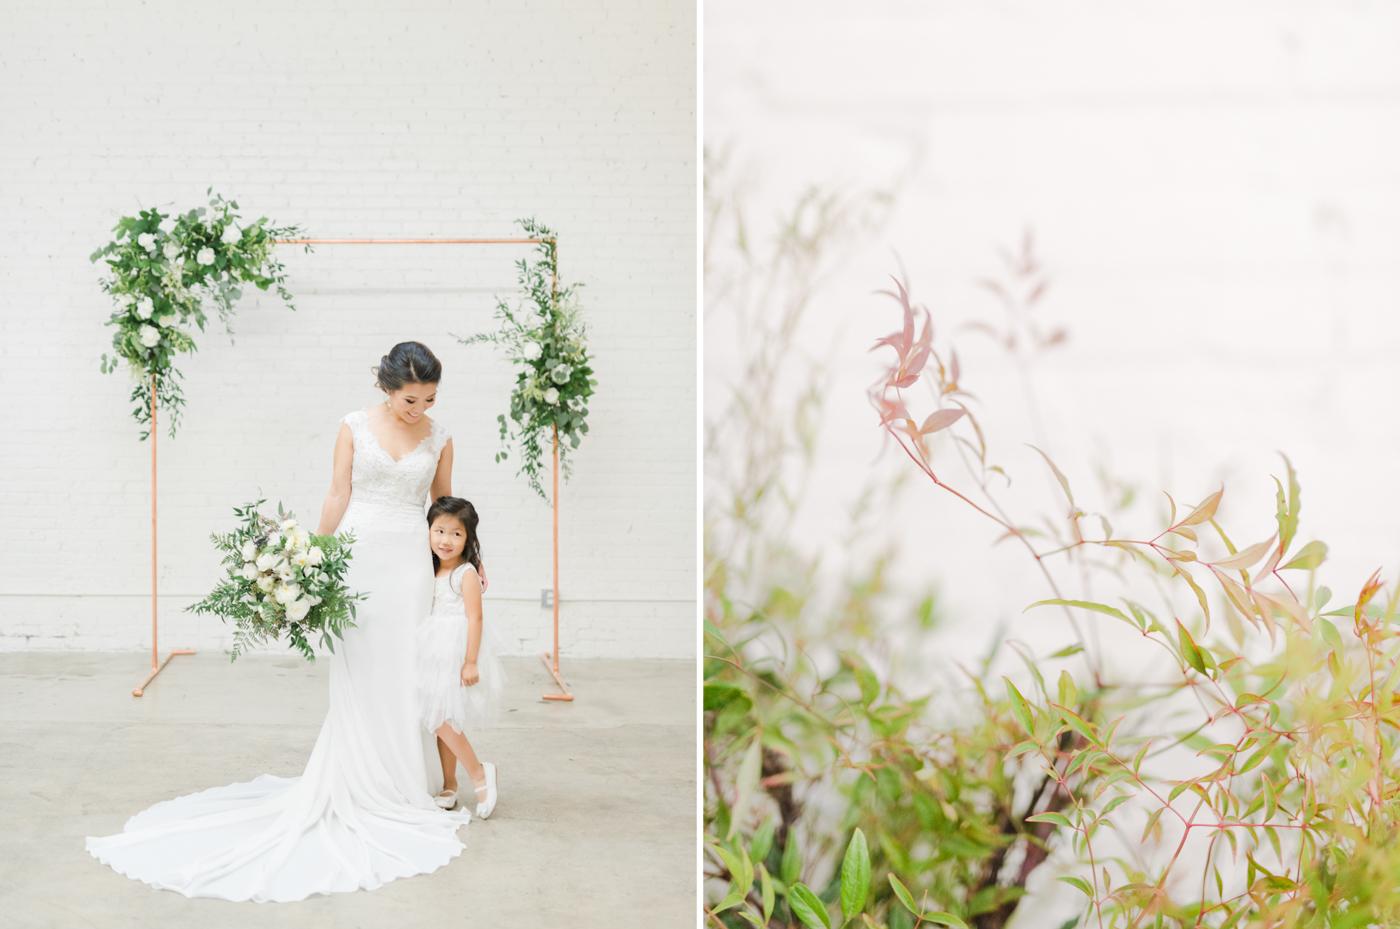 Modern_Wedding_HNYPT_Honeypot_LA_Photographer_Los_Angeles-33.jpg